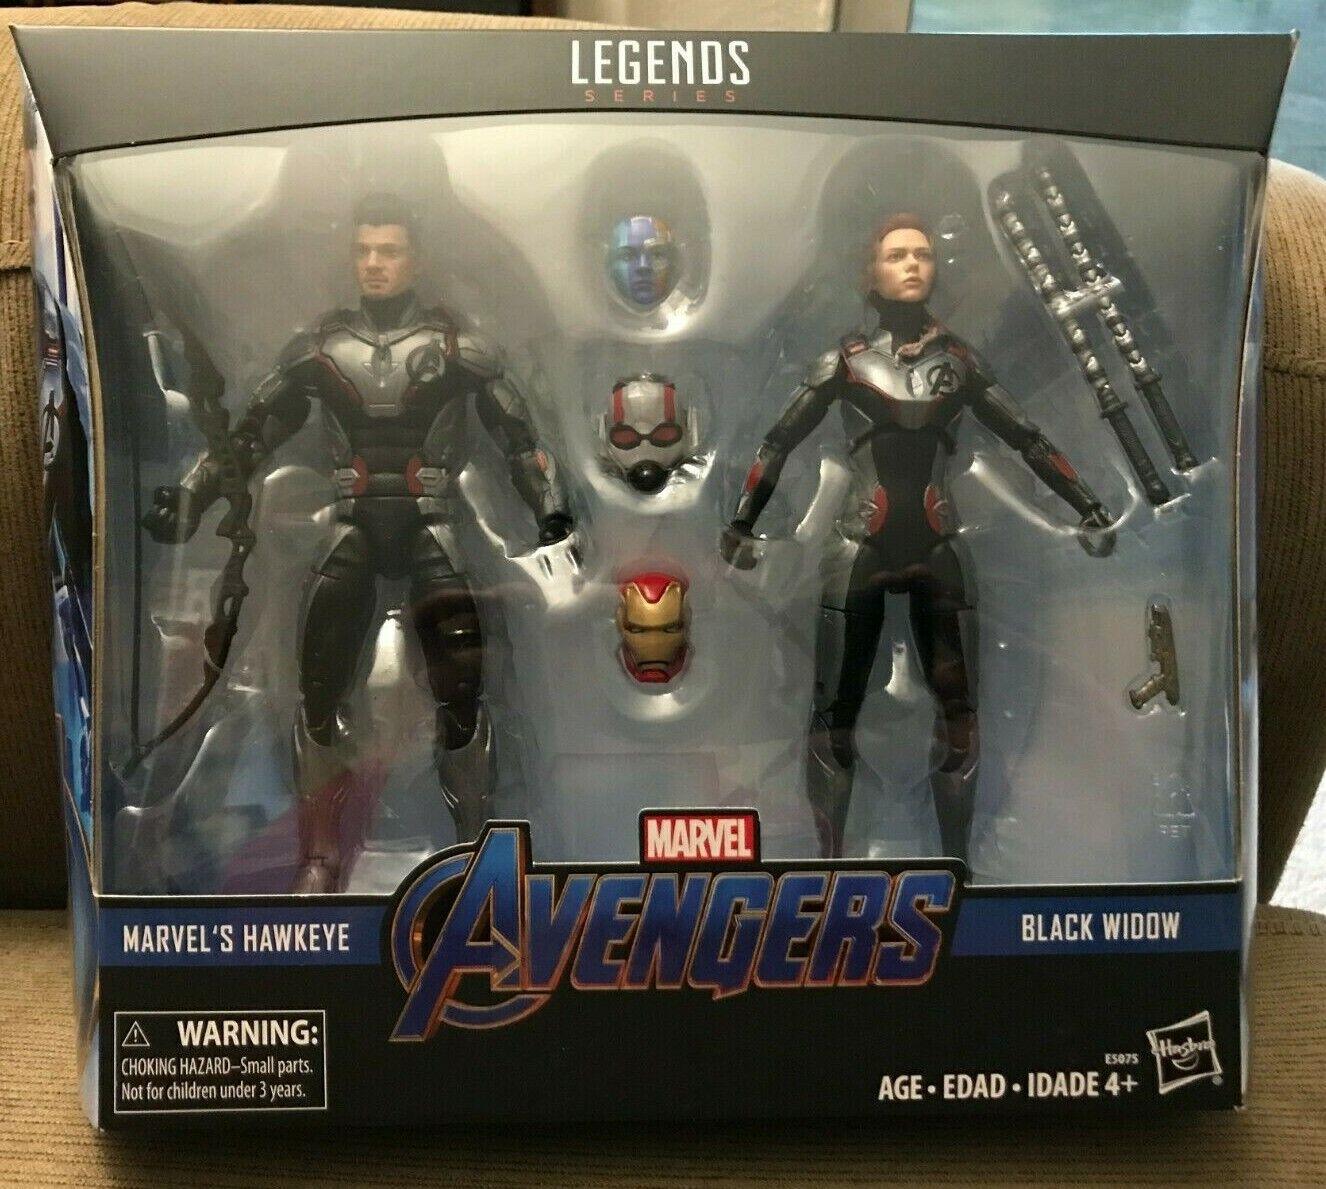 Marvel Leyendas Vengadores viuda negra de destino Tacho 2 Pack Hawkeye Hierro Ant Man